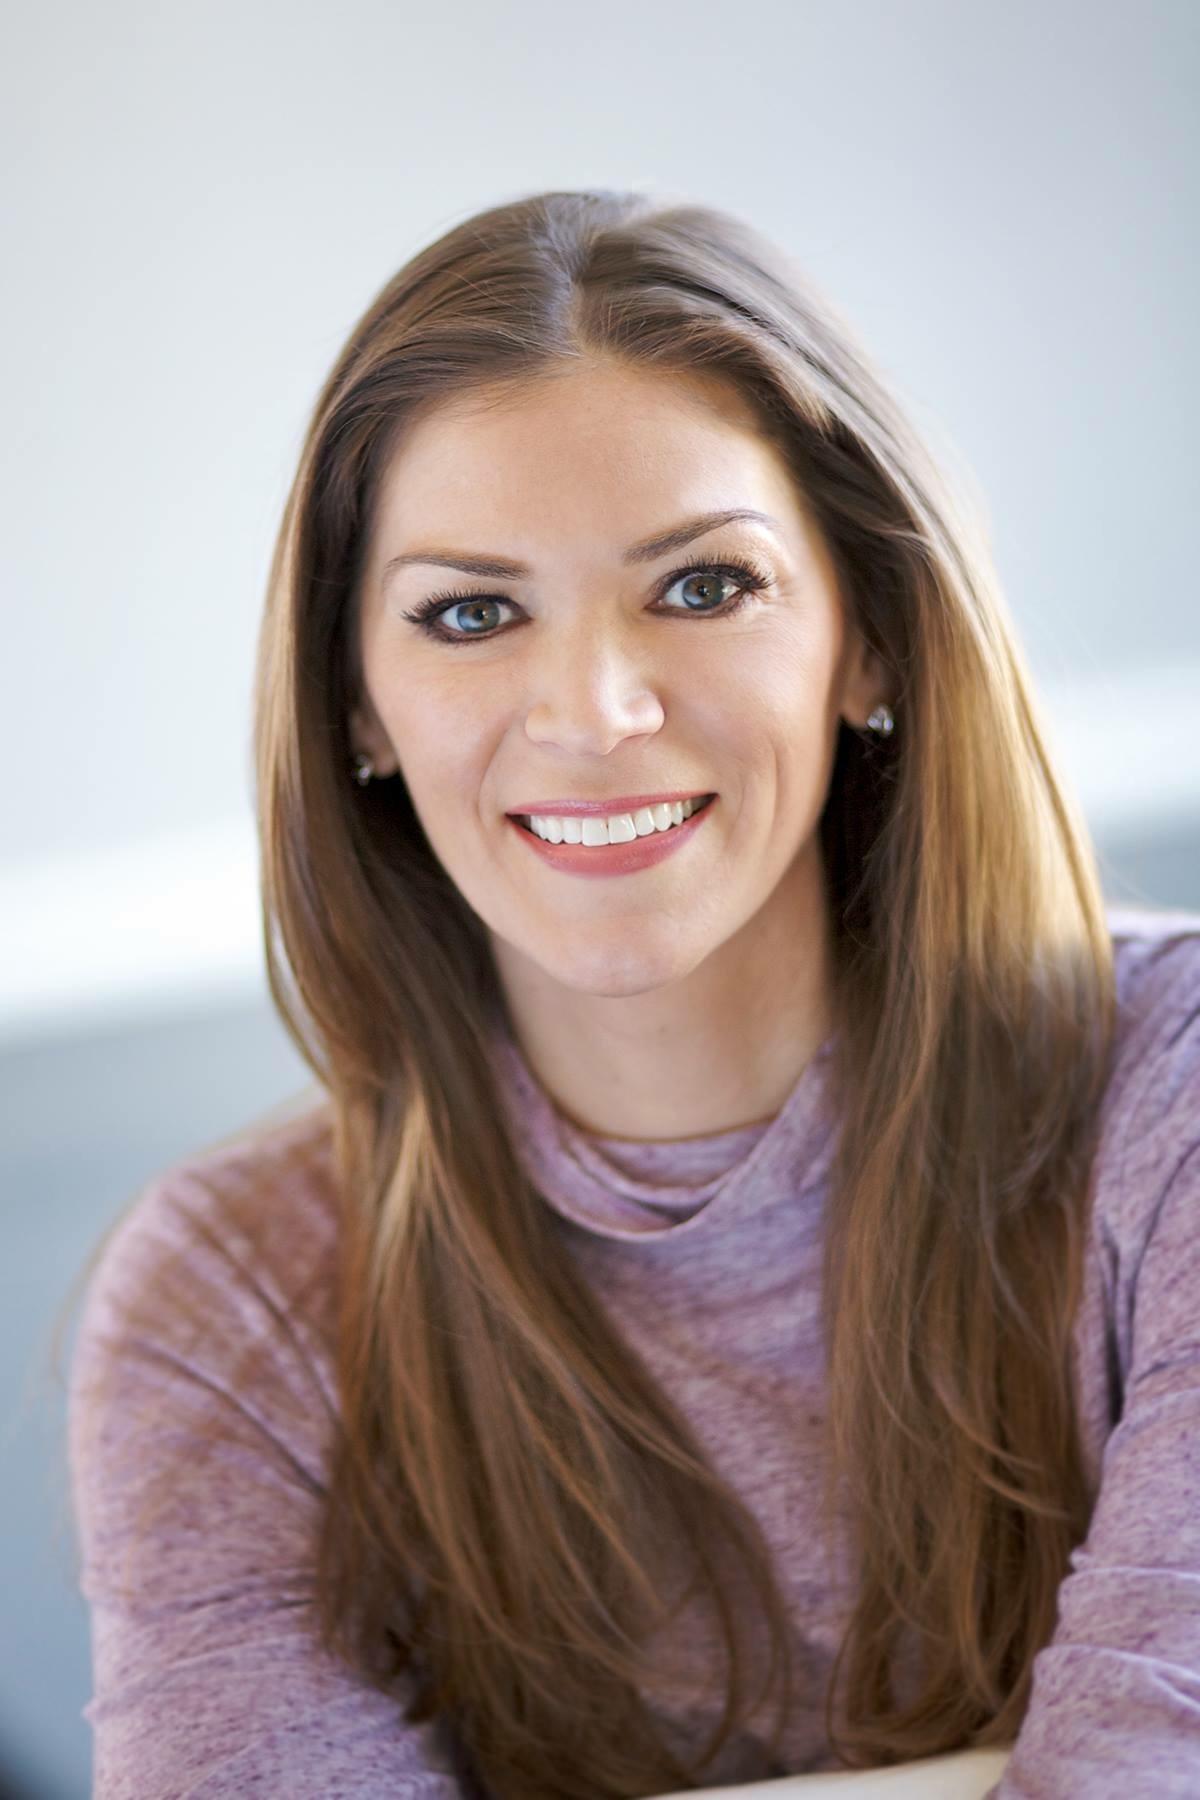 Christen Shefchunas - Professional Confidence CoachNaked Confidence Author